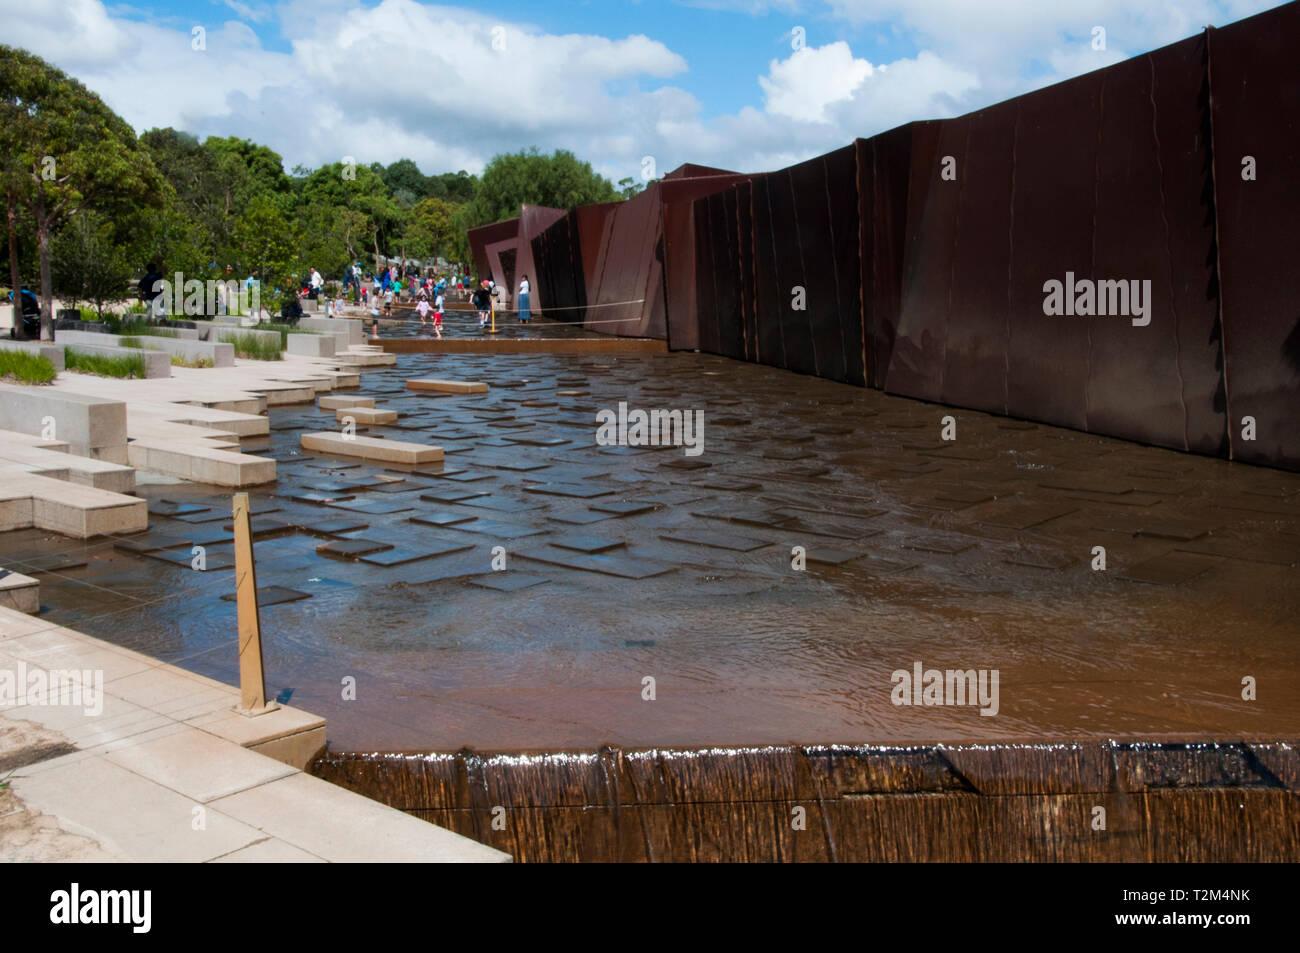 Rockpool Waterway and Escarpment Wall at the Australian Garden, Royal Botanic Gardens, Cranbourne, Victoria, Australia Stock Photo